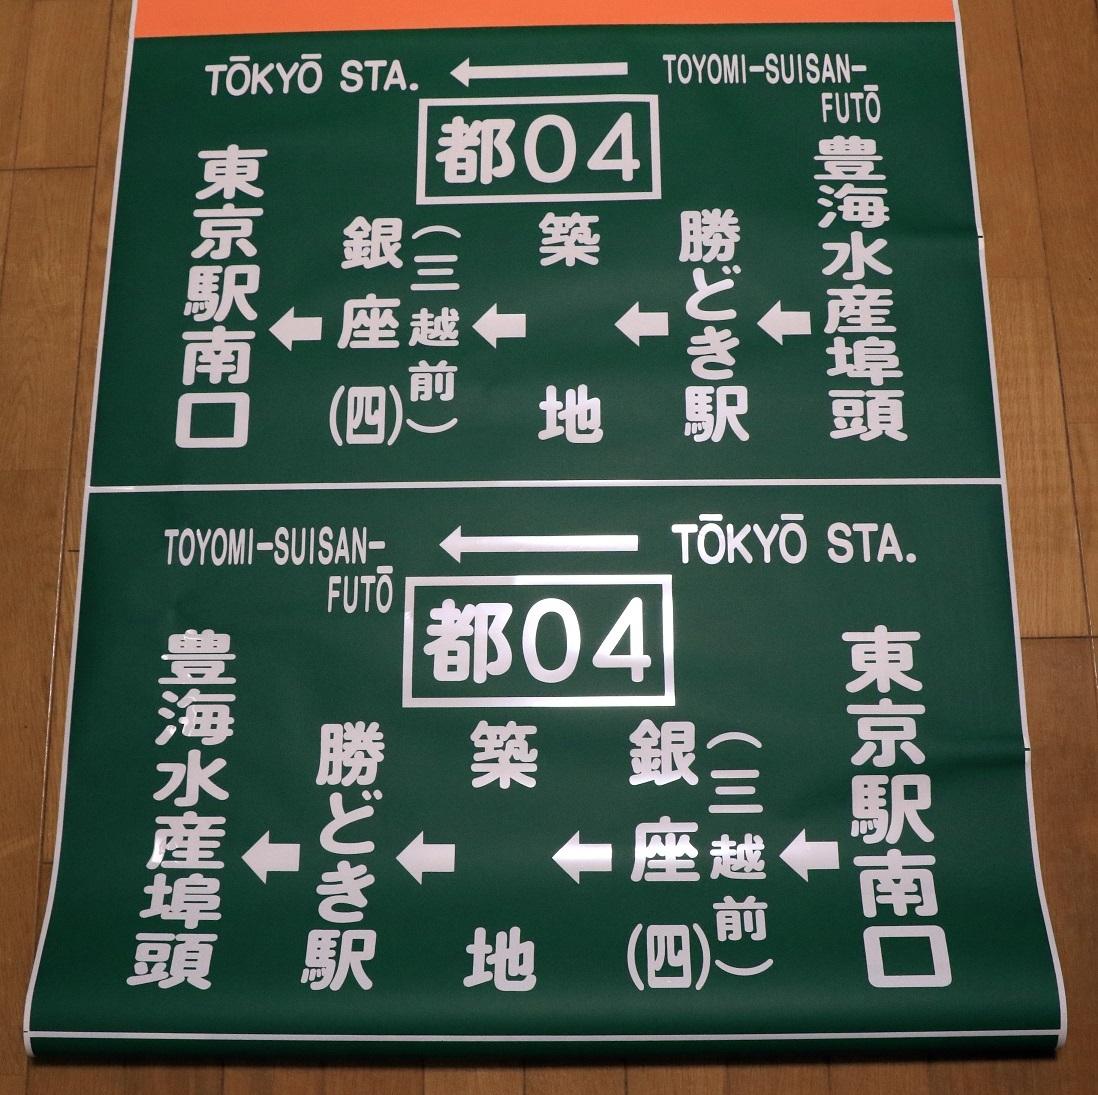 【都営バス】深川営業所・側面方向幕/98コマ収録/H2.4~使用_画像6